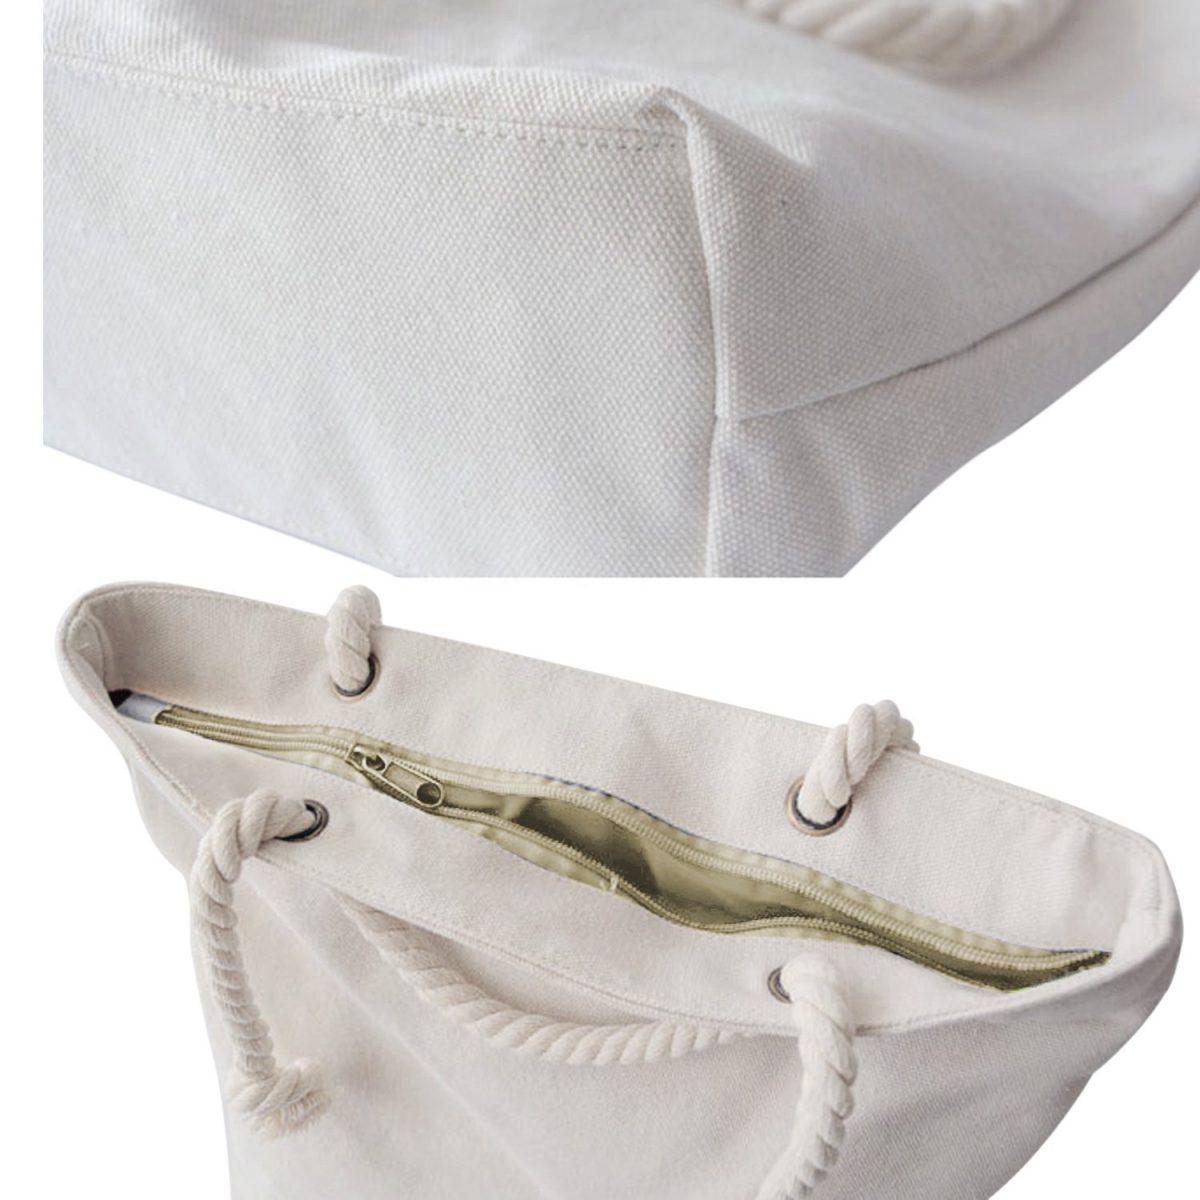 Gri Zeminli Ekose Desenli Fermuarlı Modern Kumaş Çanta Realhomes